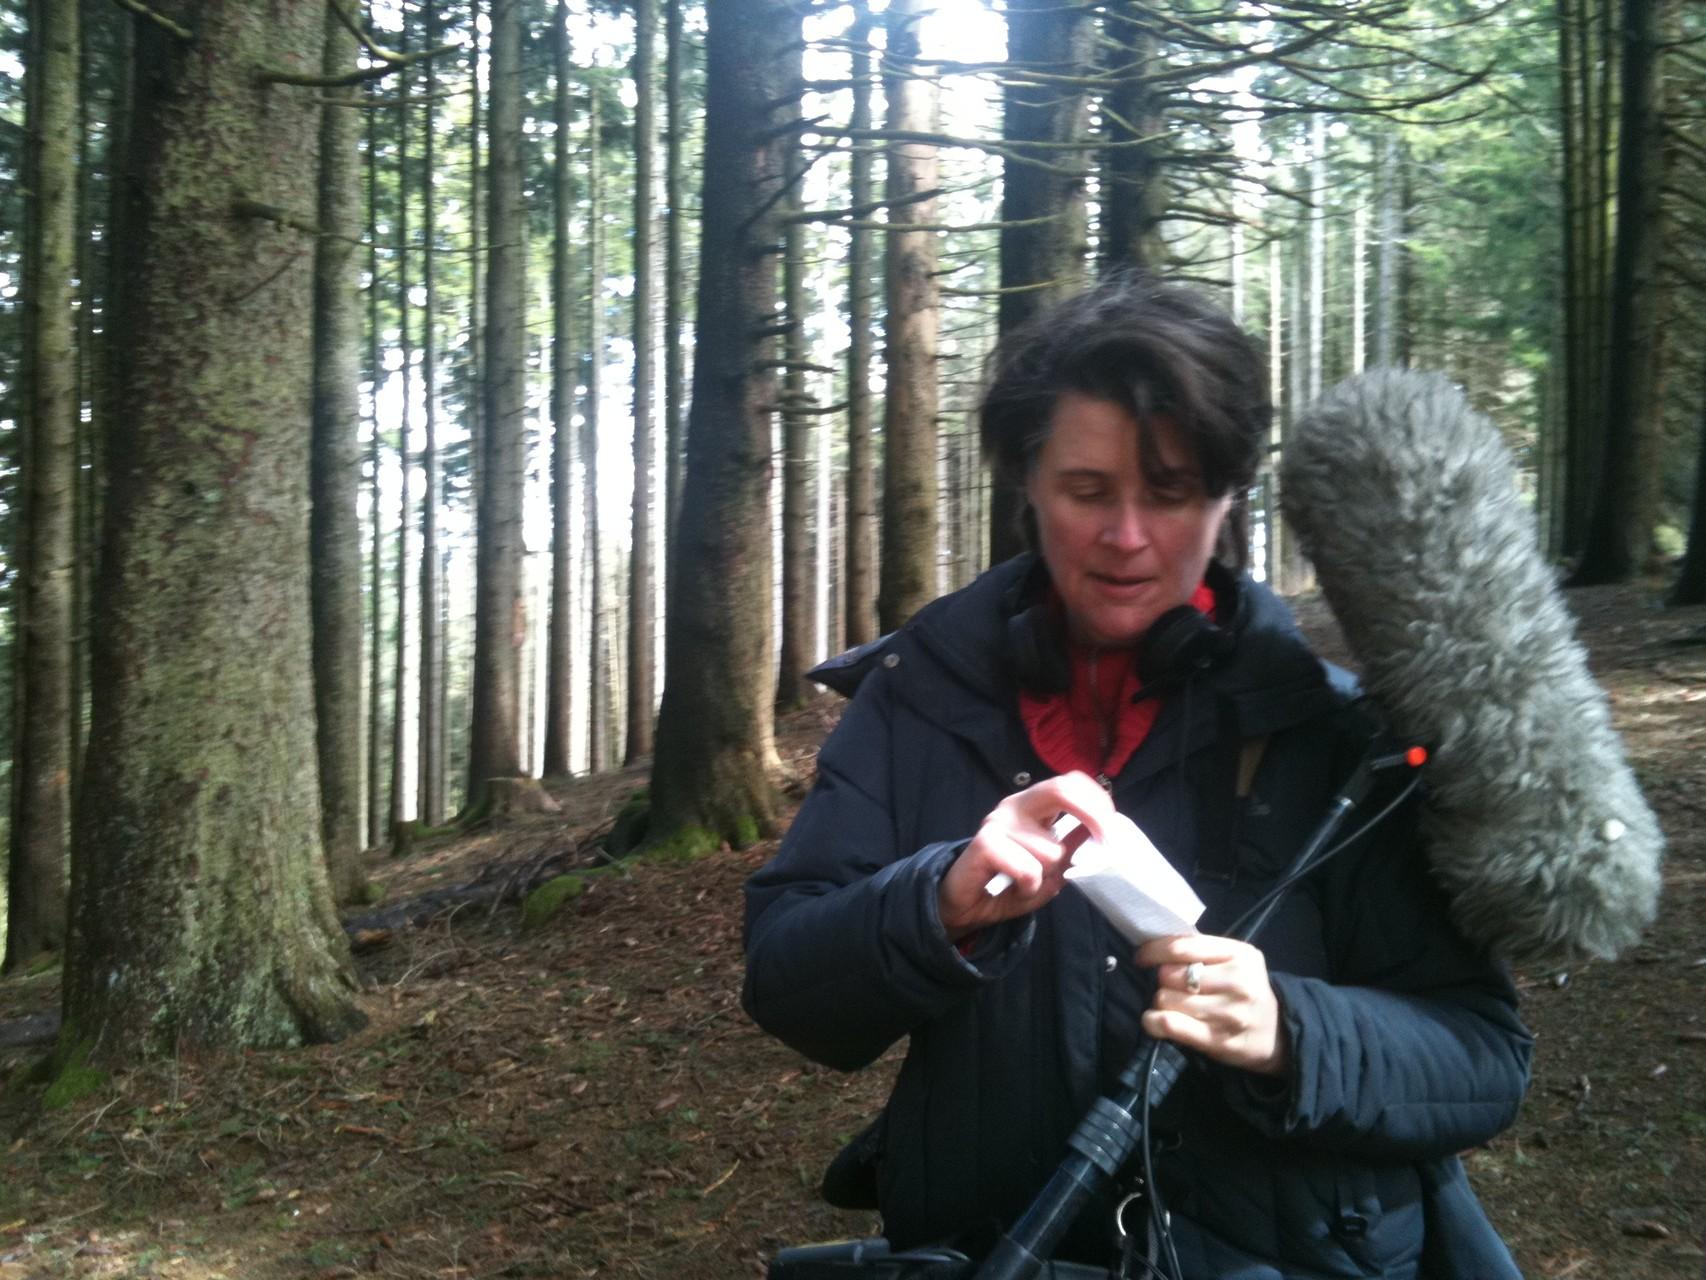 Tonaufnahme im Wald